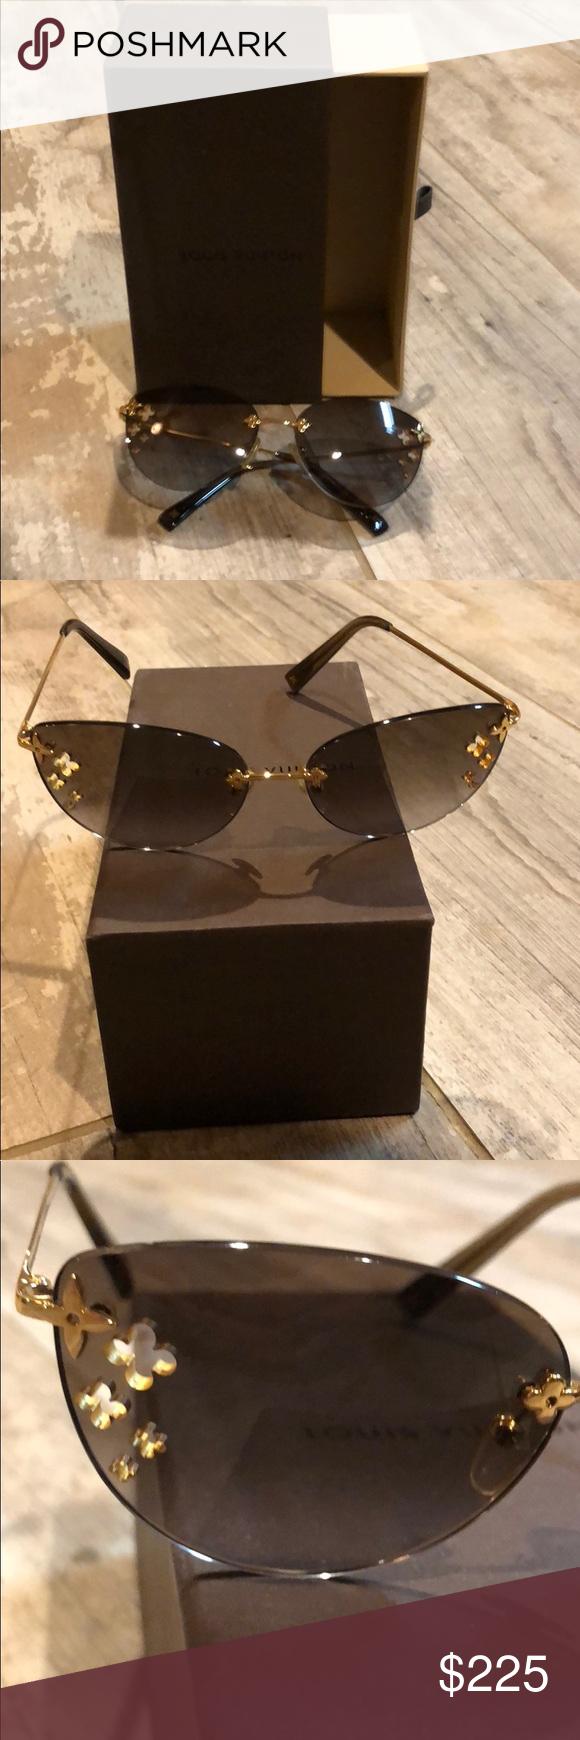 6706770a00 Louis Vuitton Sunglasses never worn Louis Vuitton Sunglasses ...